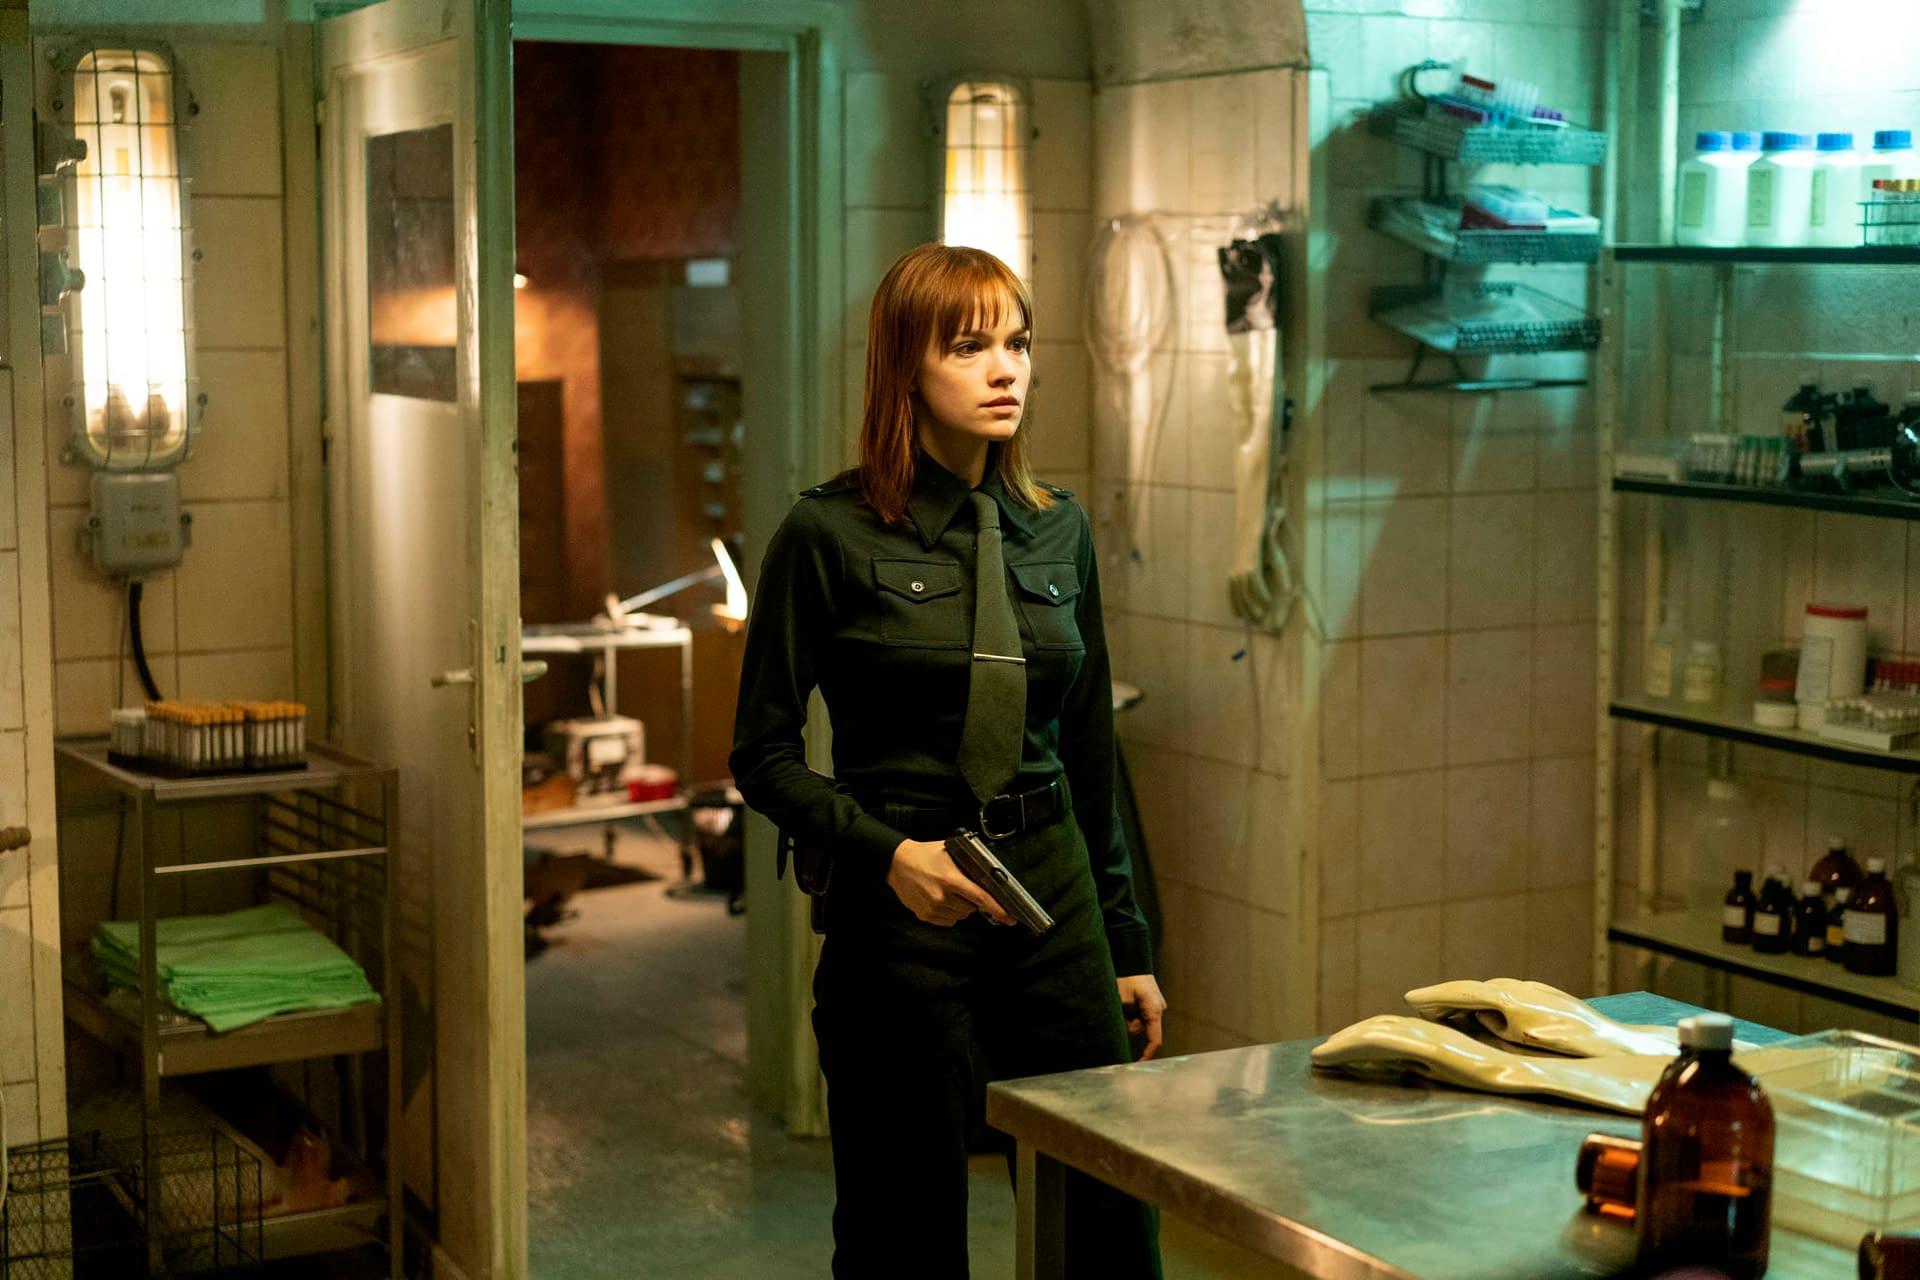 """Treadstone"": USA Network's Jason Bourne Spinoff Series ""Awakens"" [PREVIEW]"